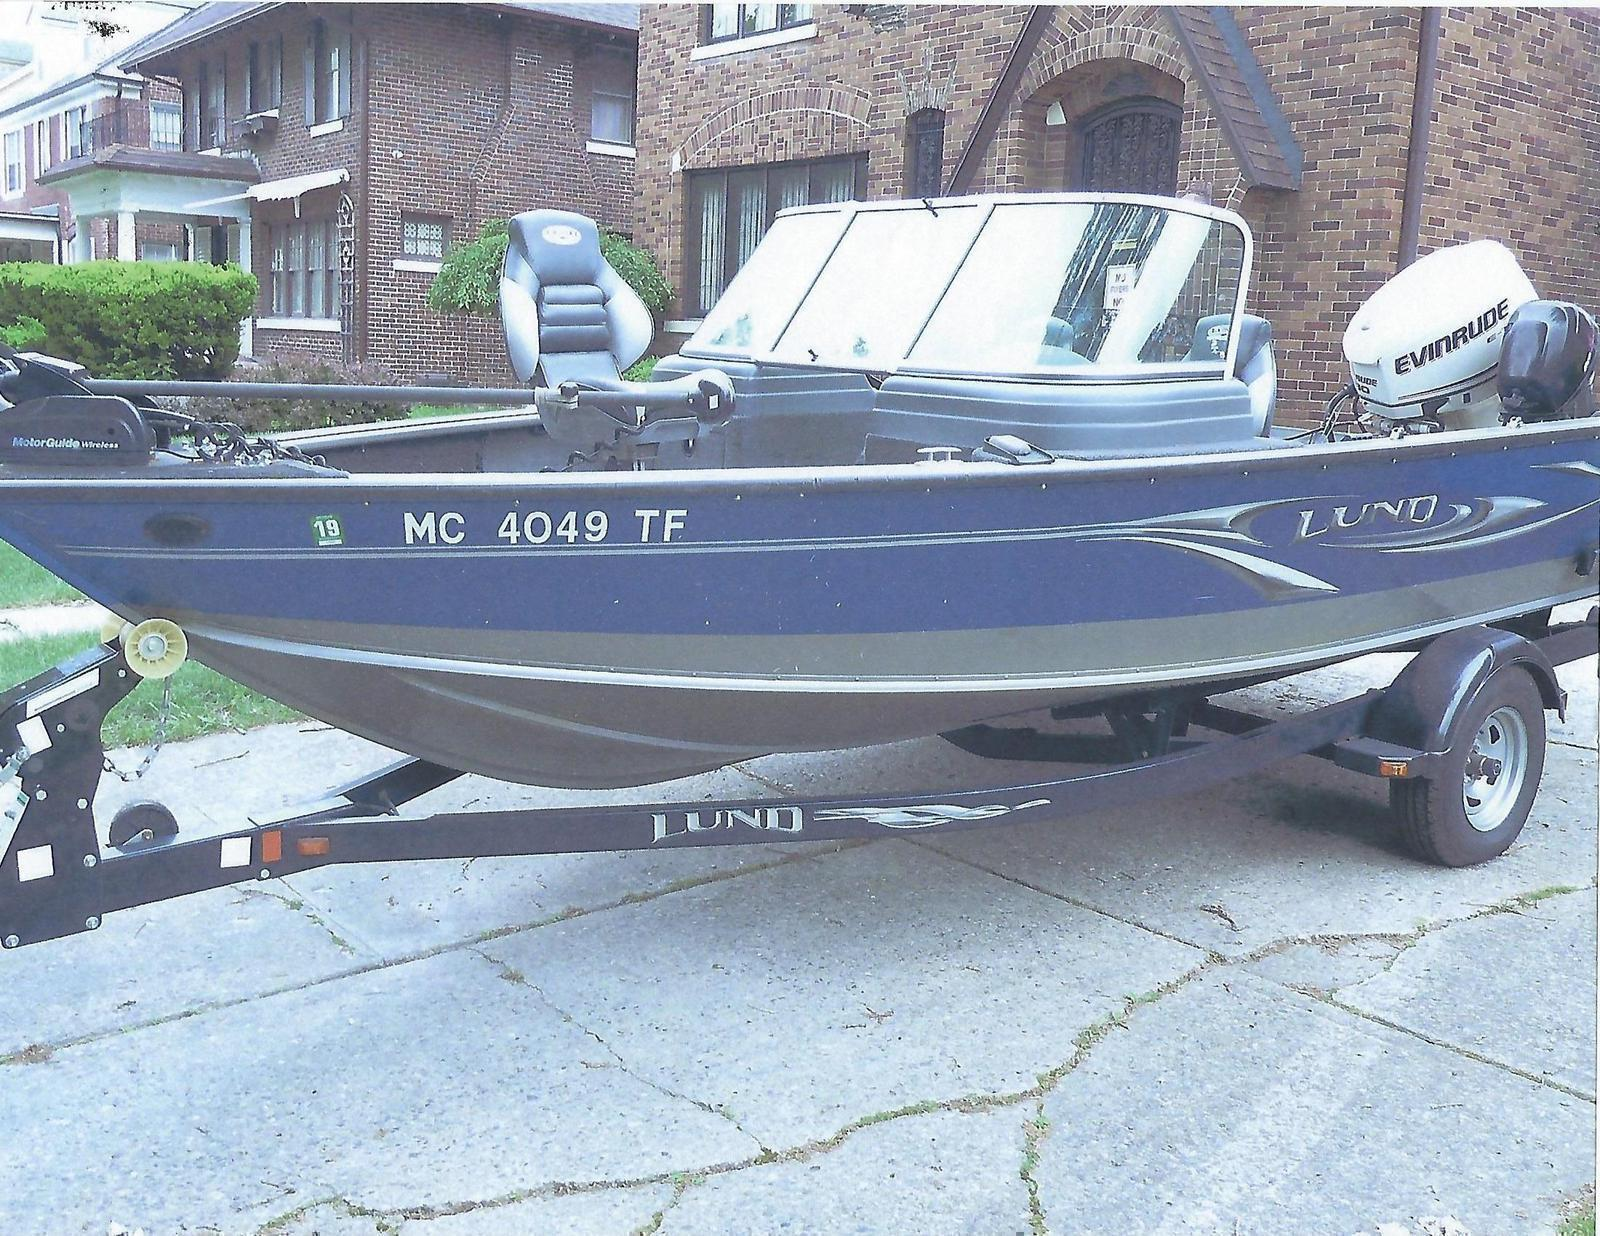 Inventory Angler's Marine Prop & Sail Taylor, MI (734) 287-6180